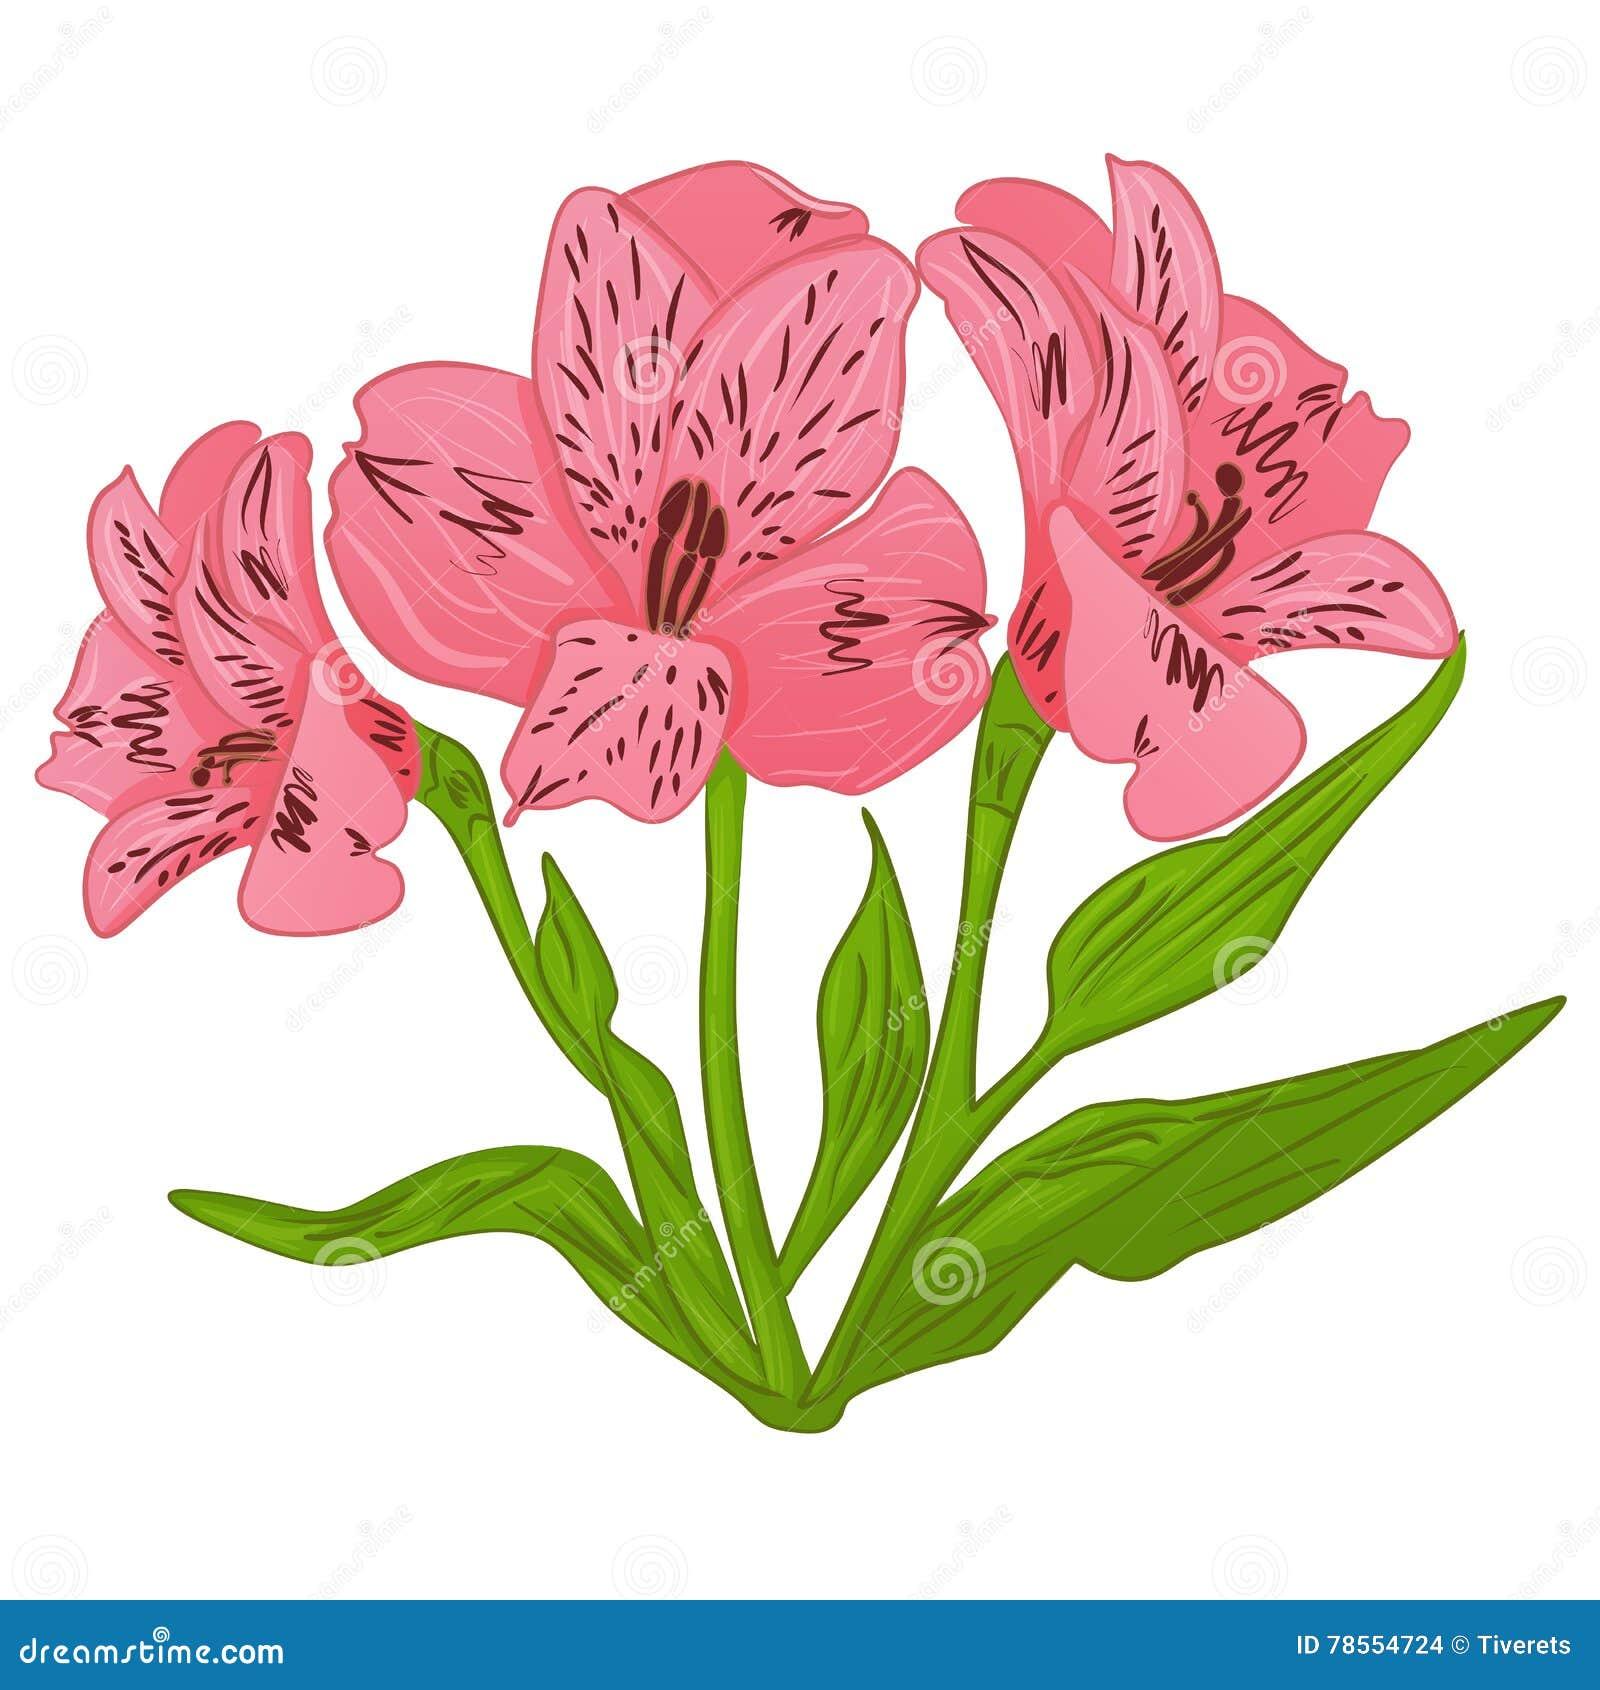 Alstroemeria cartoon pink flower and green leaves vector stock alstroemeria cartoon pink flower and green leaves vector stock vector illustration of background beautiful 78554724 izmirmasajfo